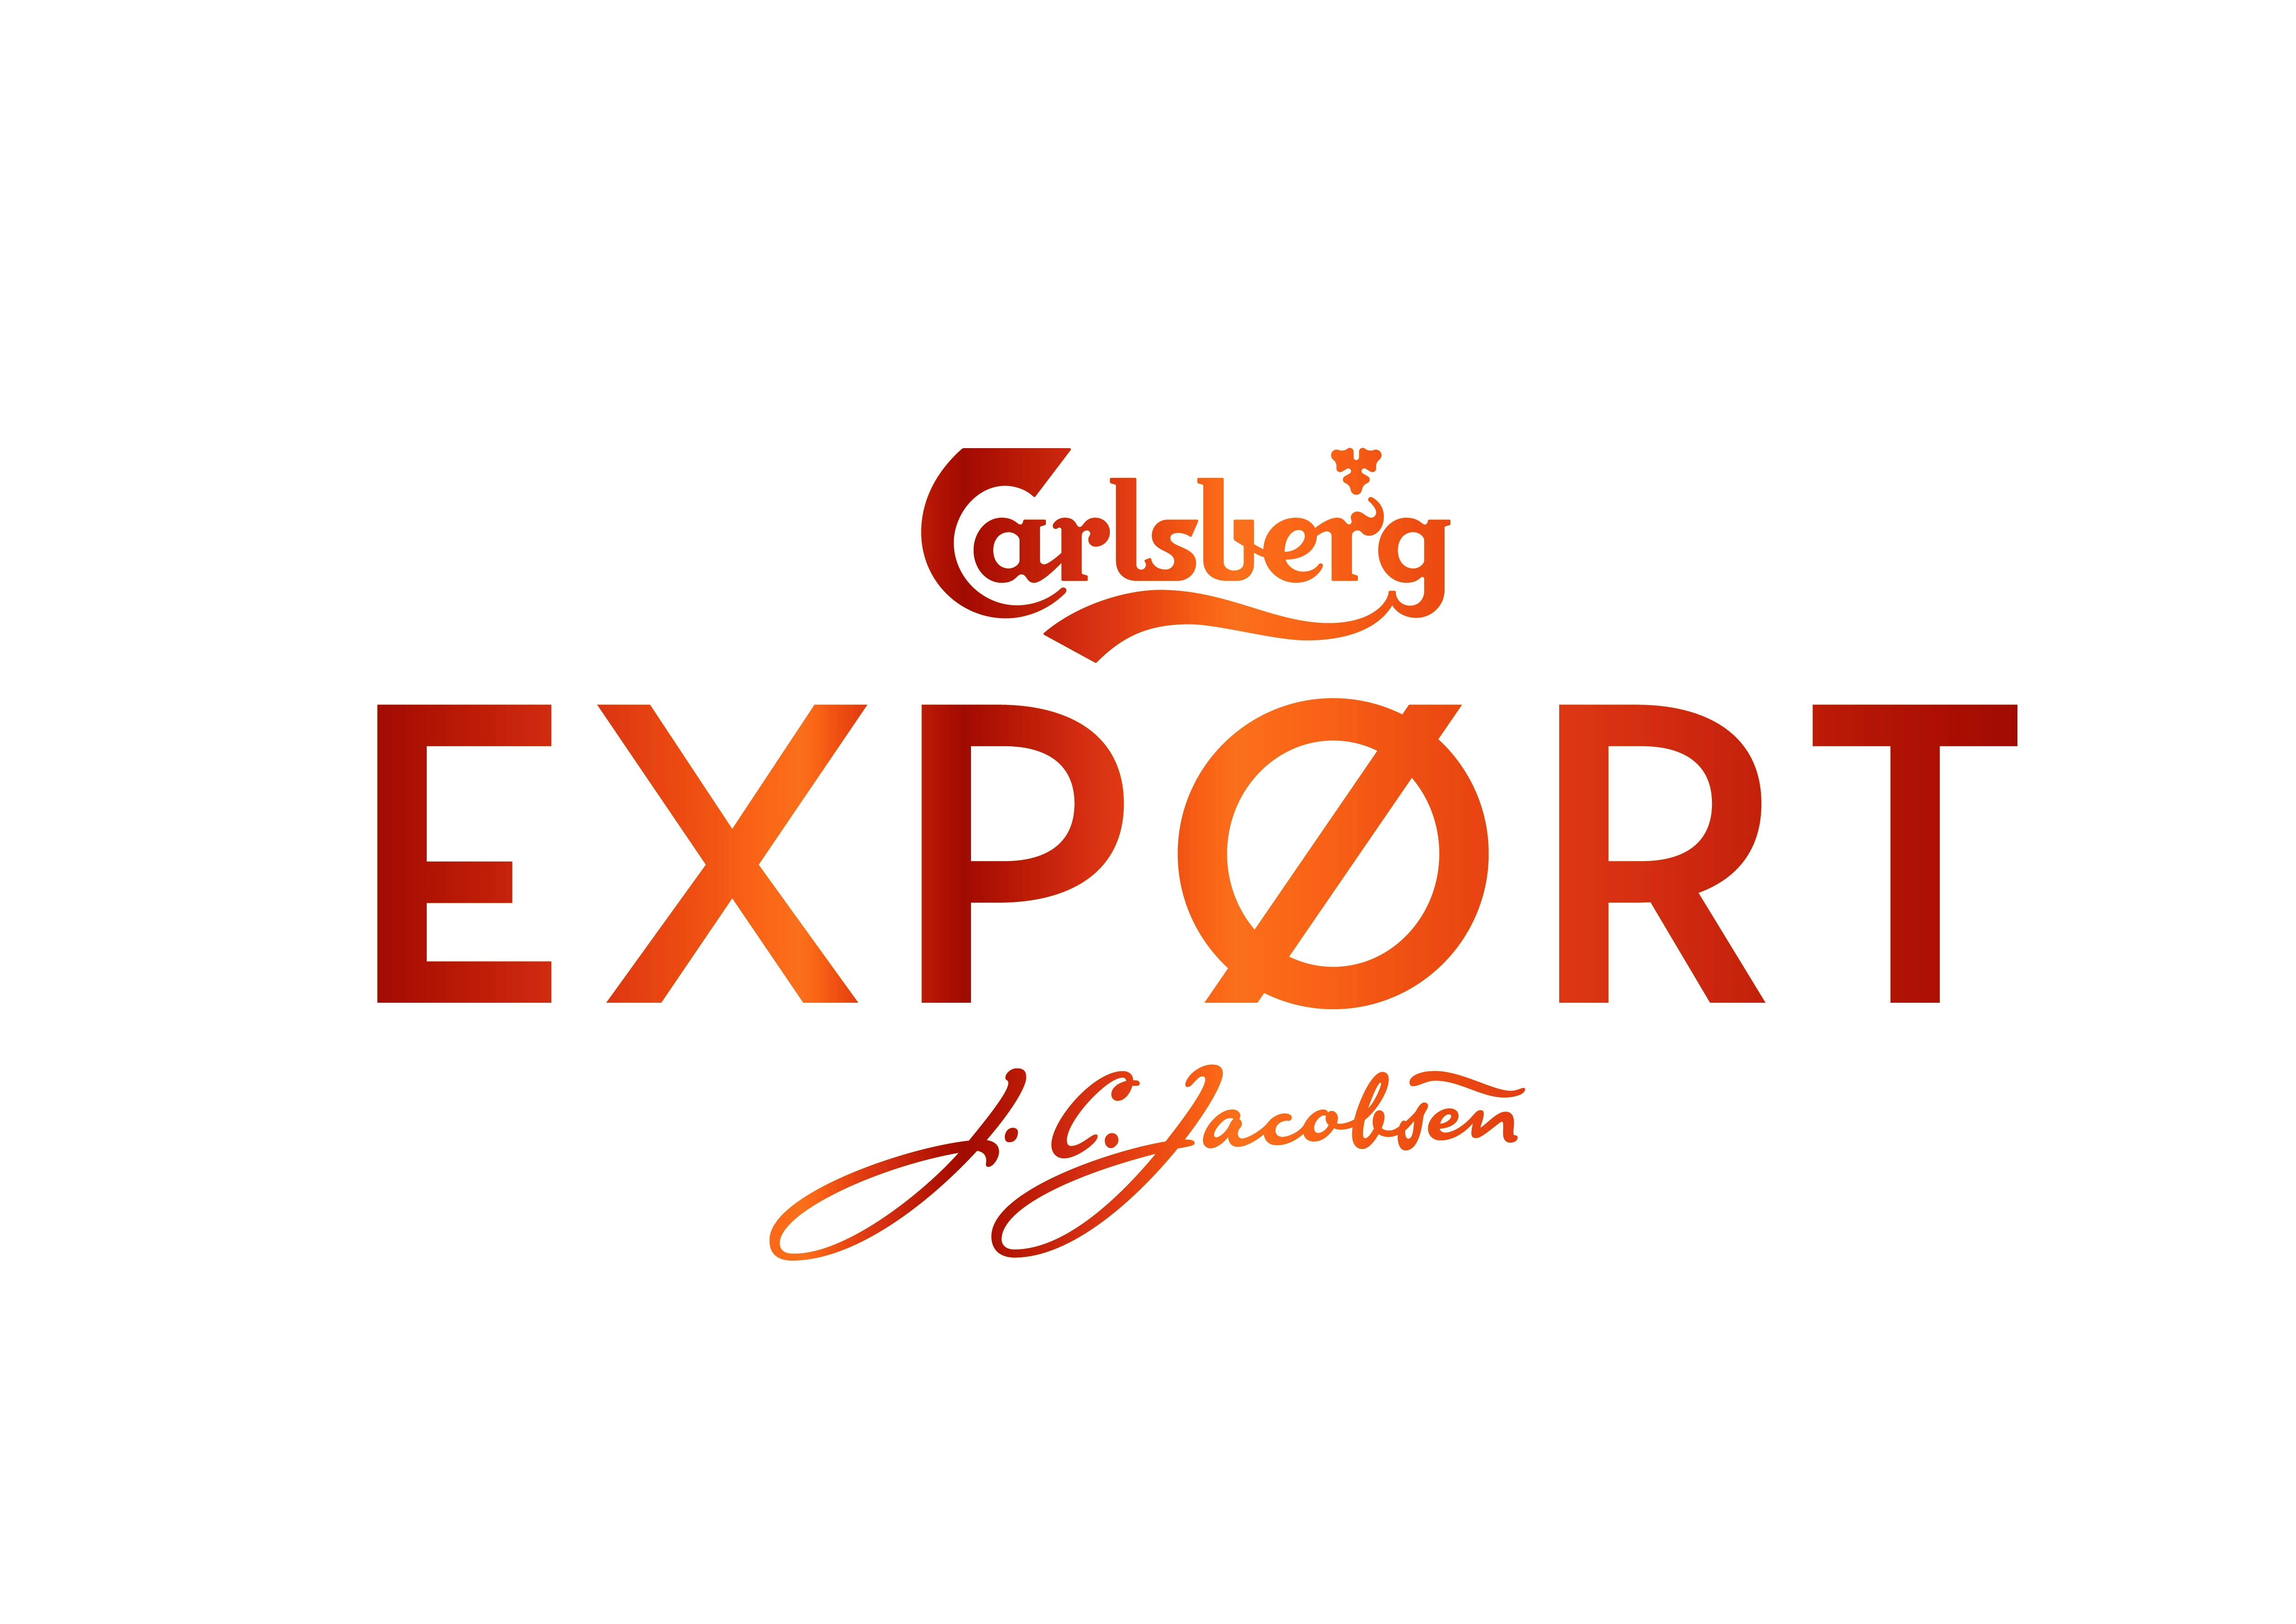 carlsberg-export-logo